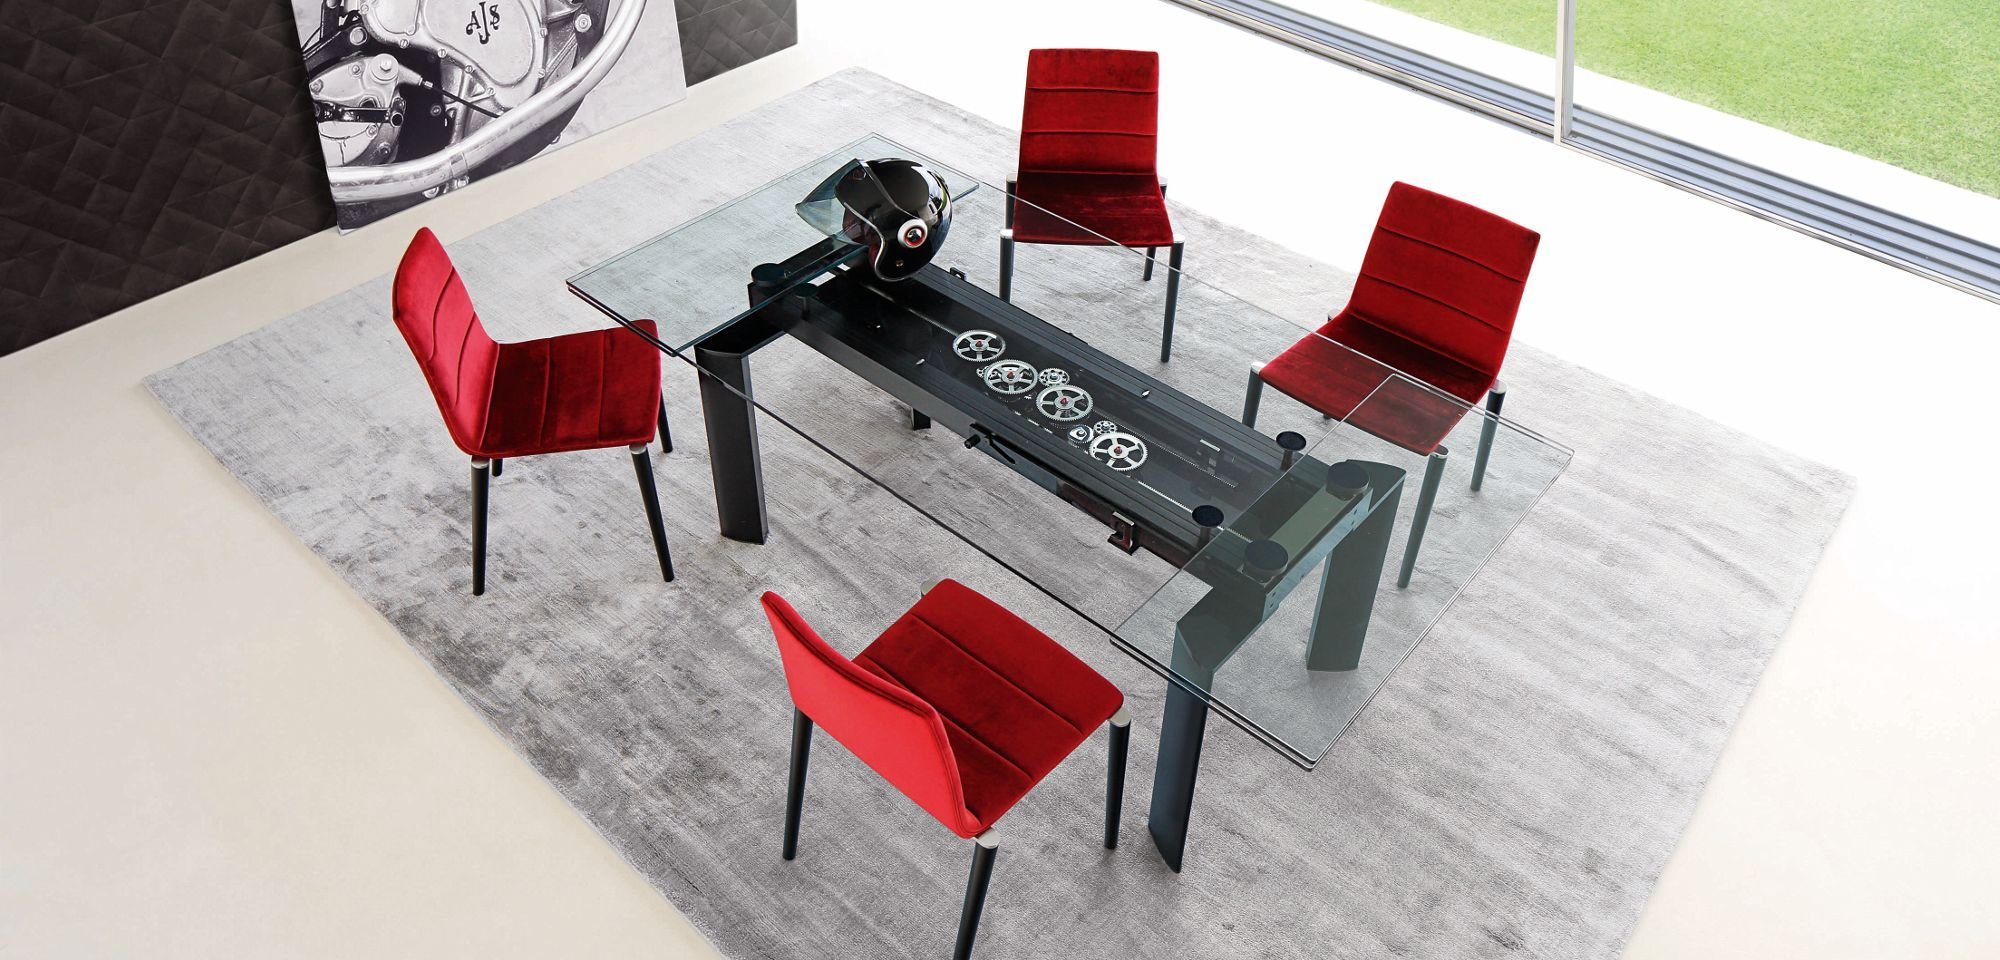 6e81cc34a3661743be3200aecd616210 Incroyable De Table Basse En Verre Design Haut De Gamme Conception